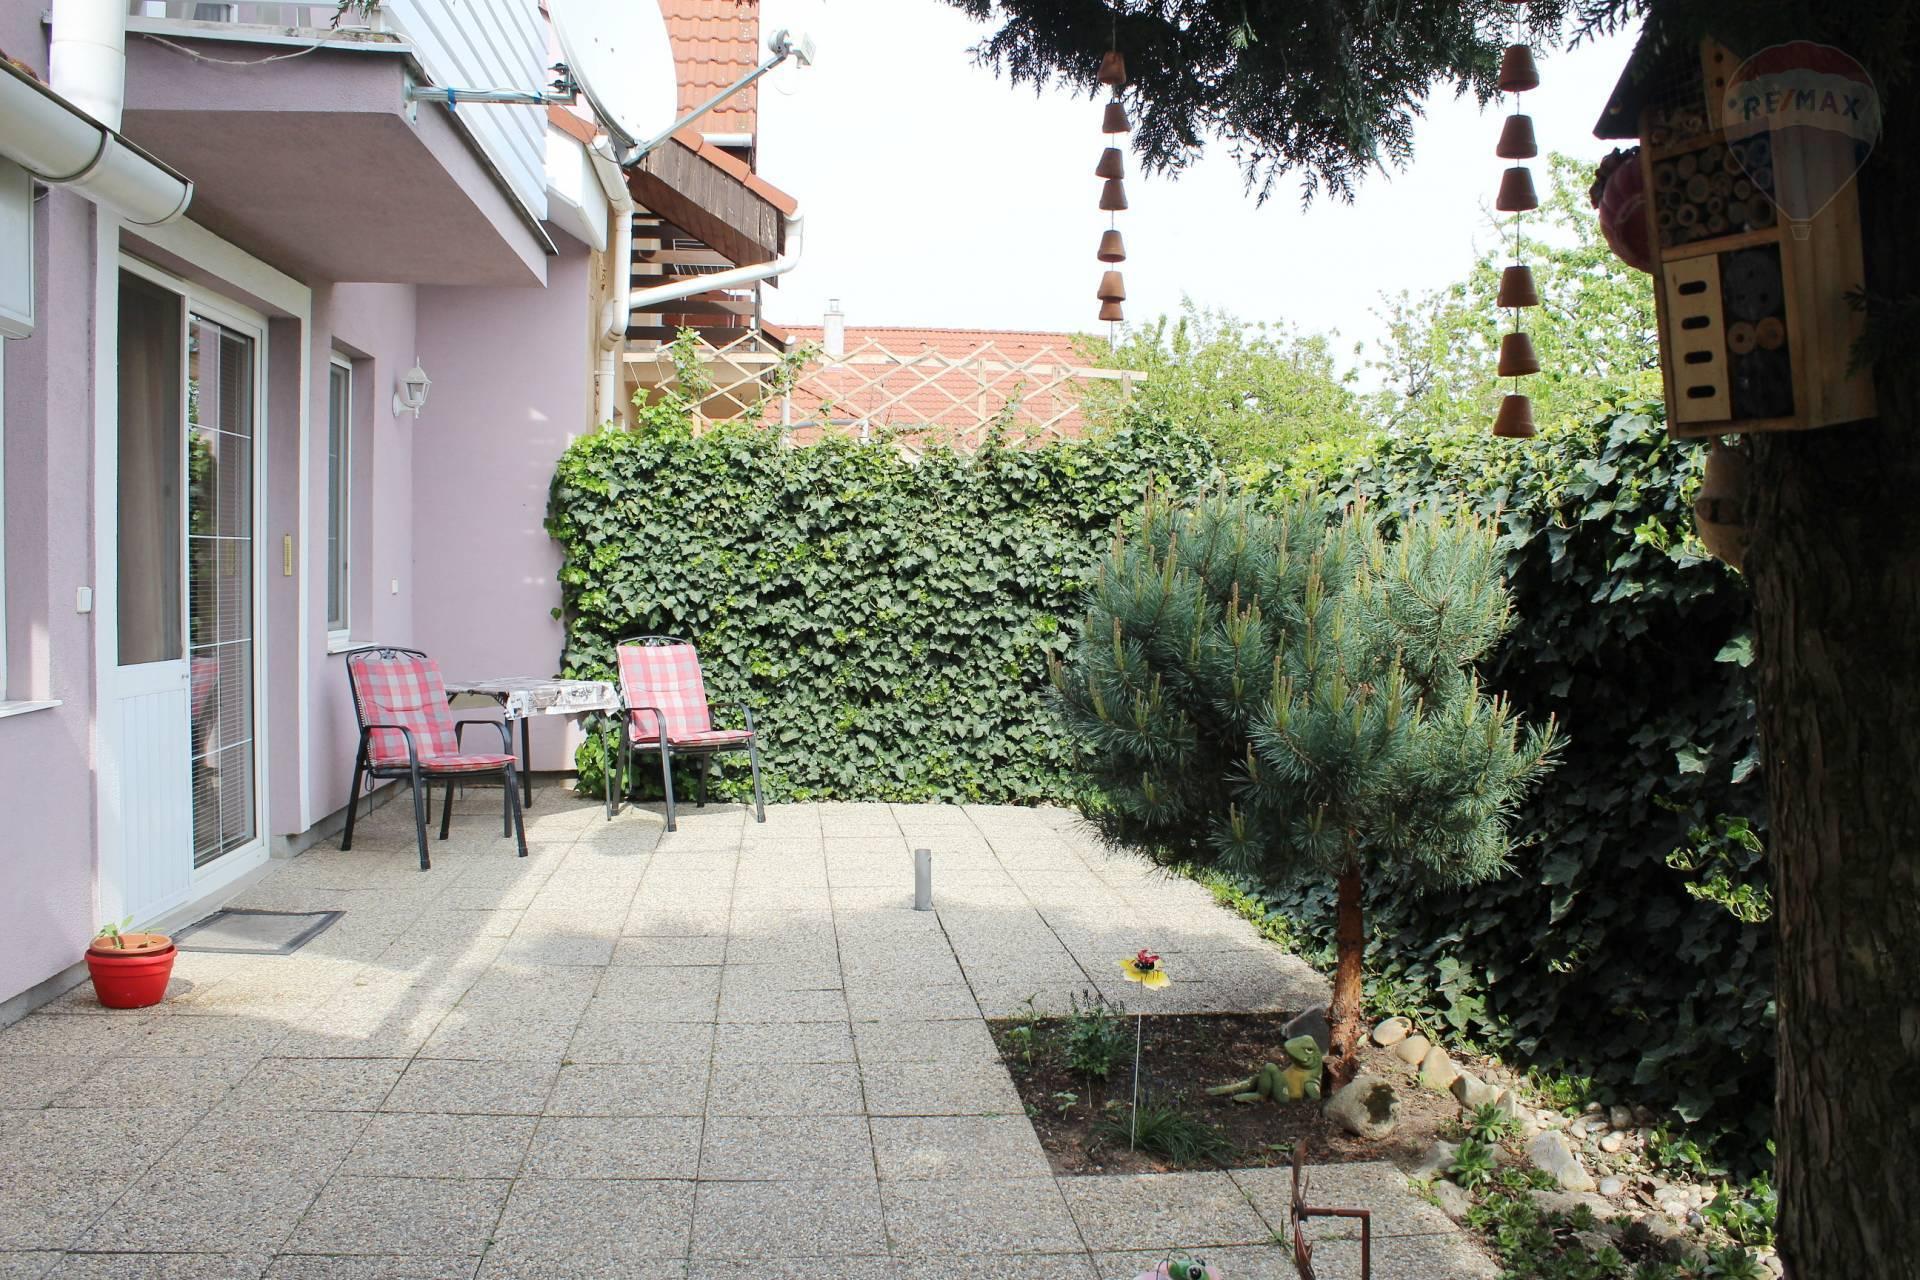 Predaj domu 114 m2, Bratislava - Podunajské Biskupice -